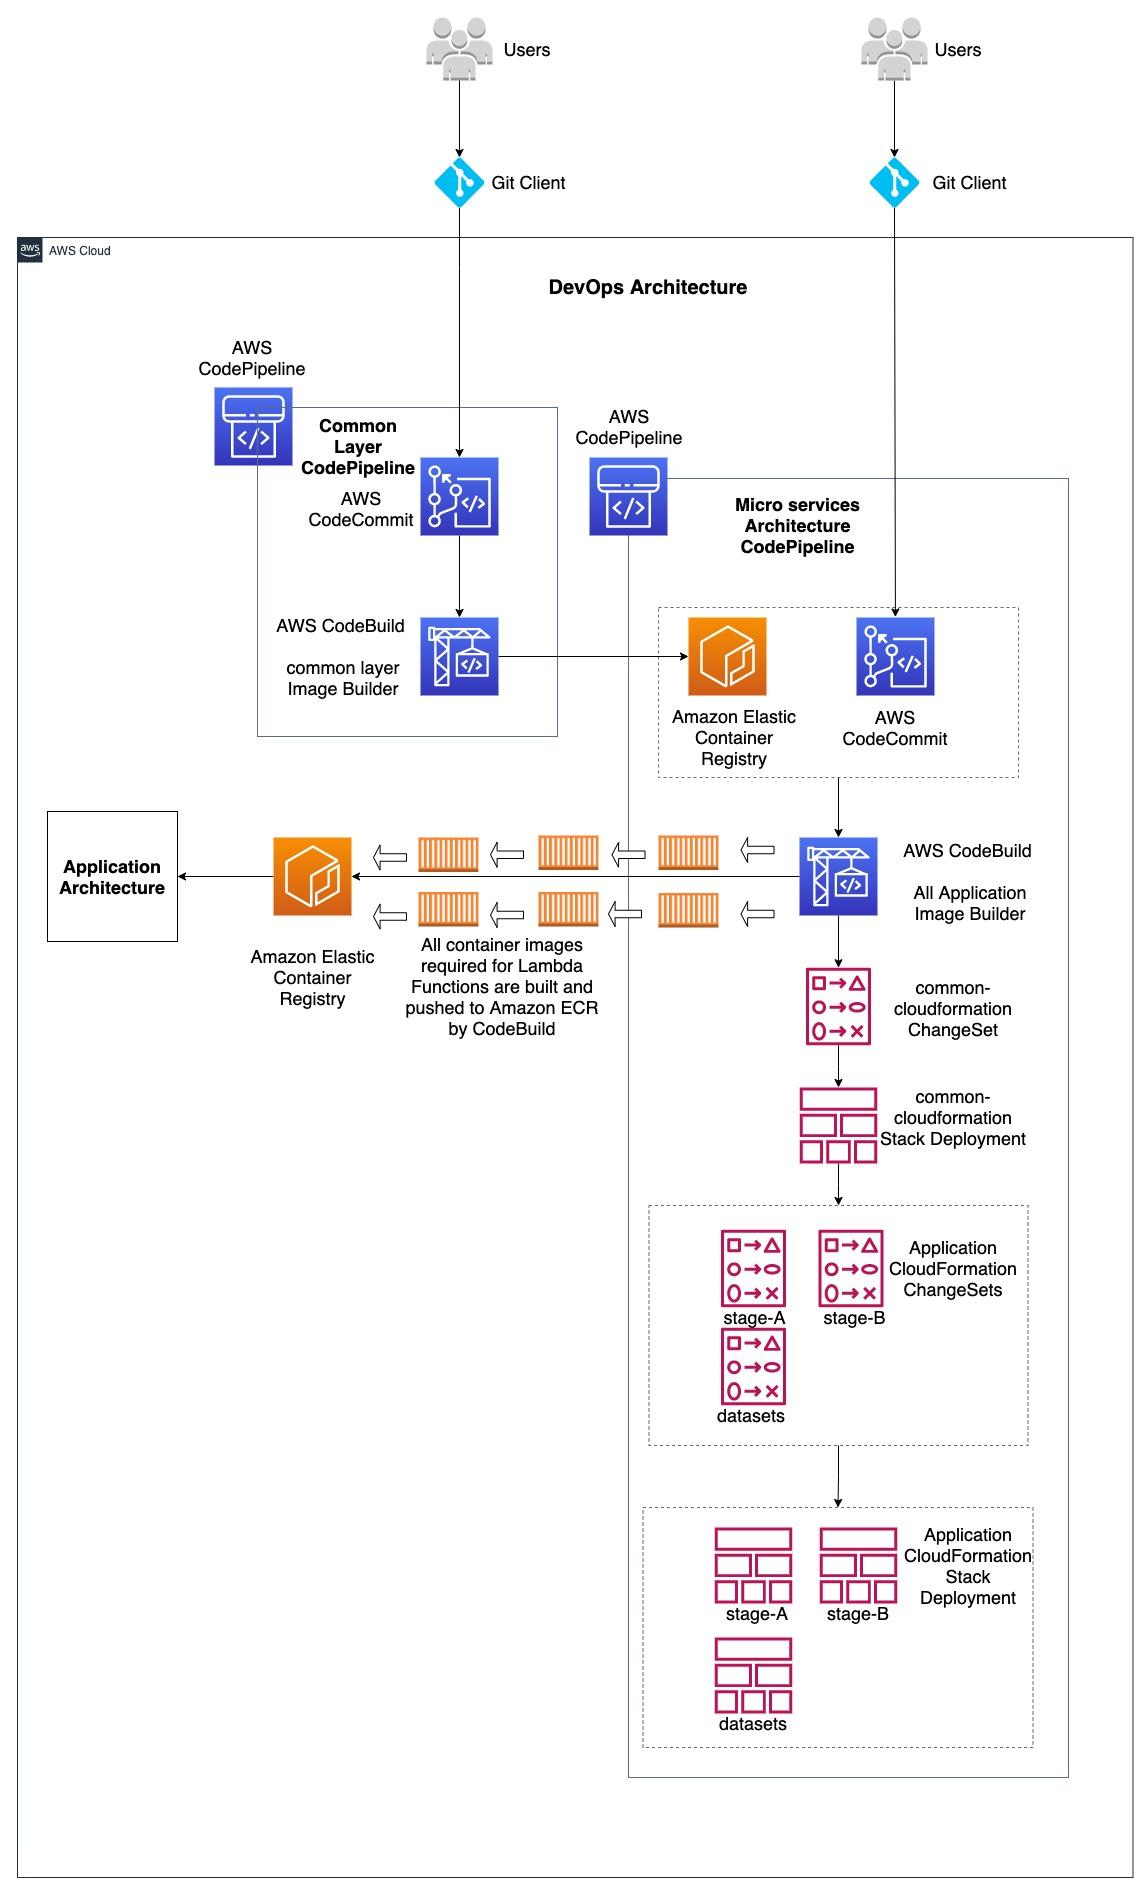 Lambda-docker-images-DevOps-Architecture